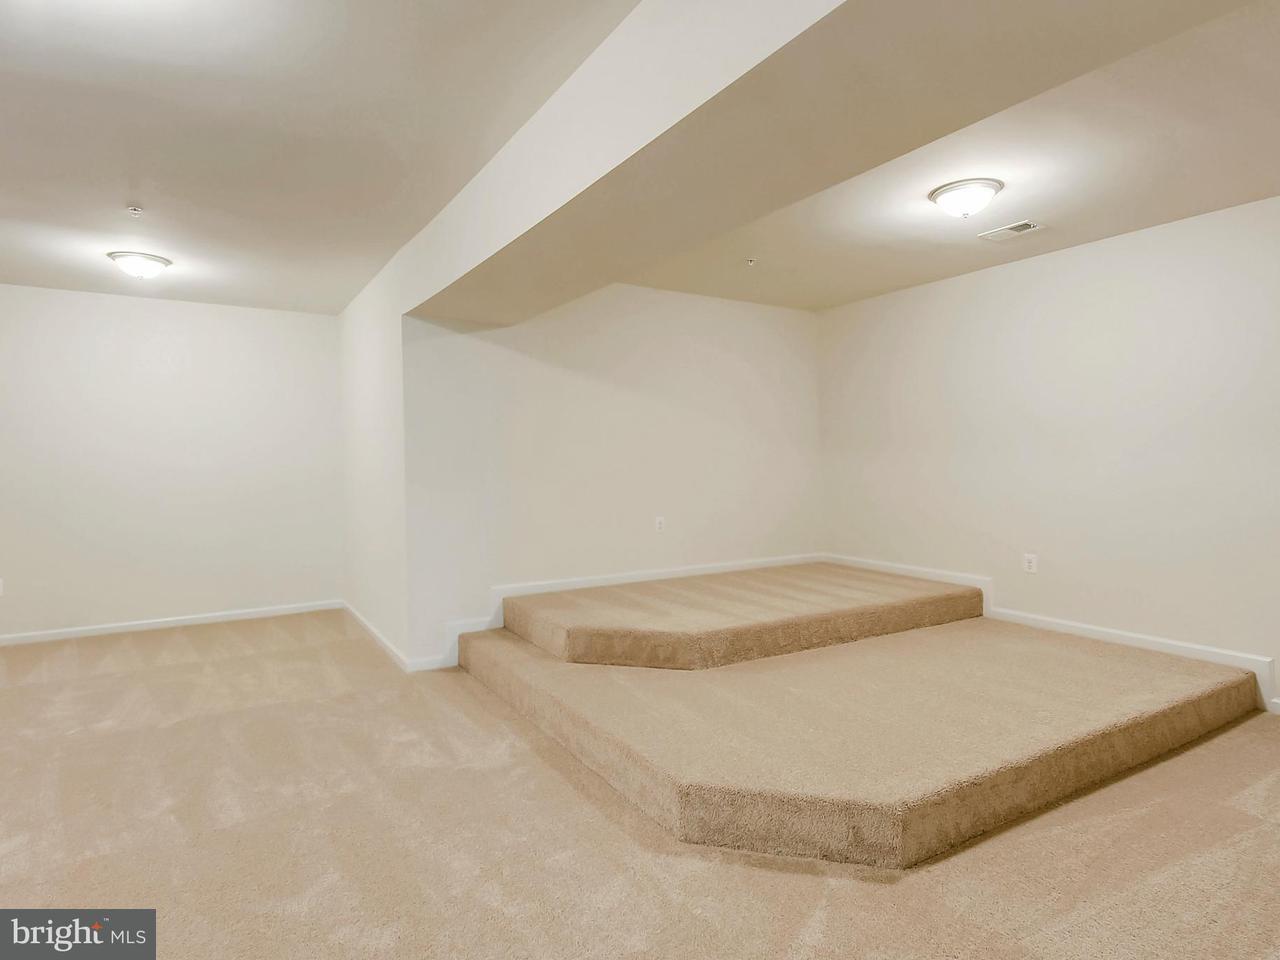 Additional photo for property listing at 15600 Taylerton Lane 15600 Taylerton Lane Brandywine, Maryland 20613 États-Unis